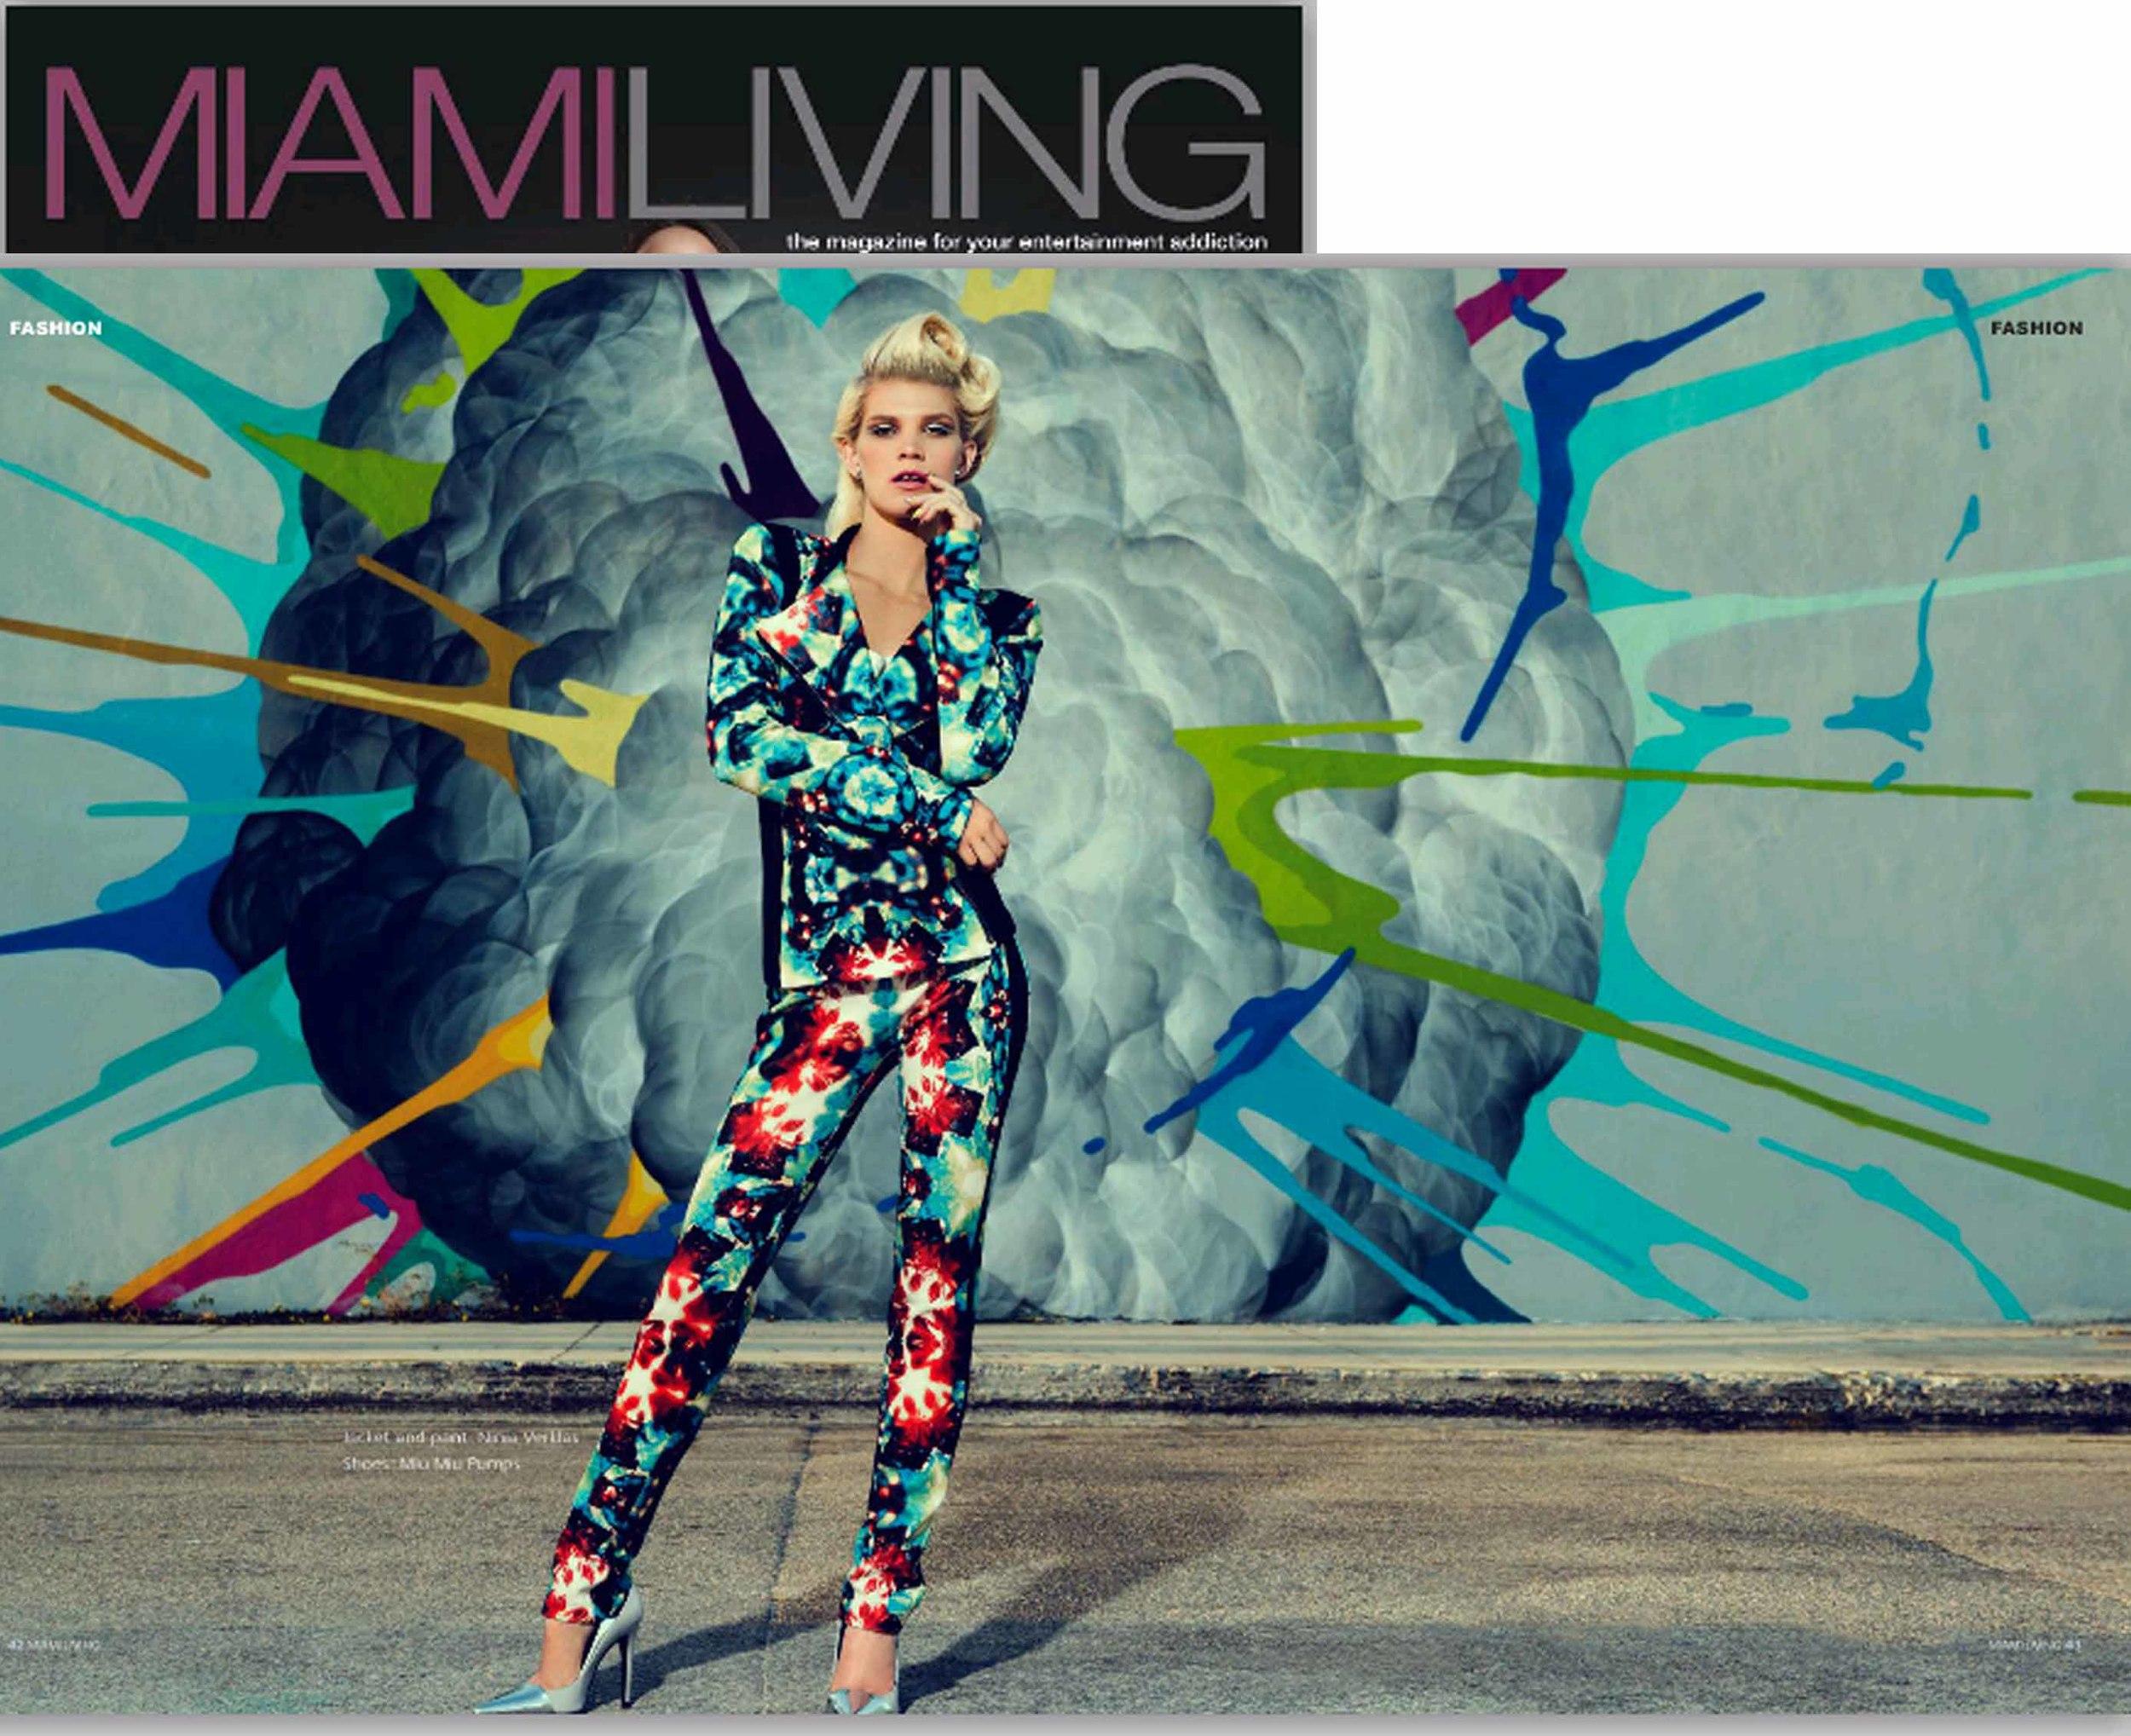 Miami Living Magazine p1.jpg